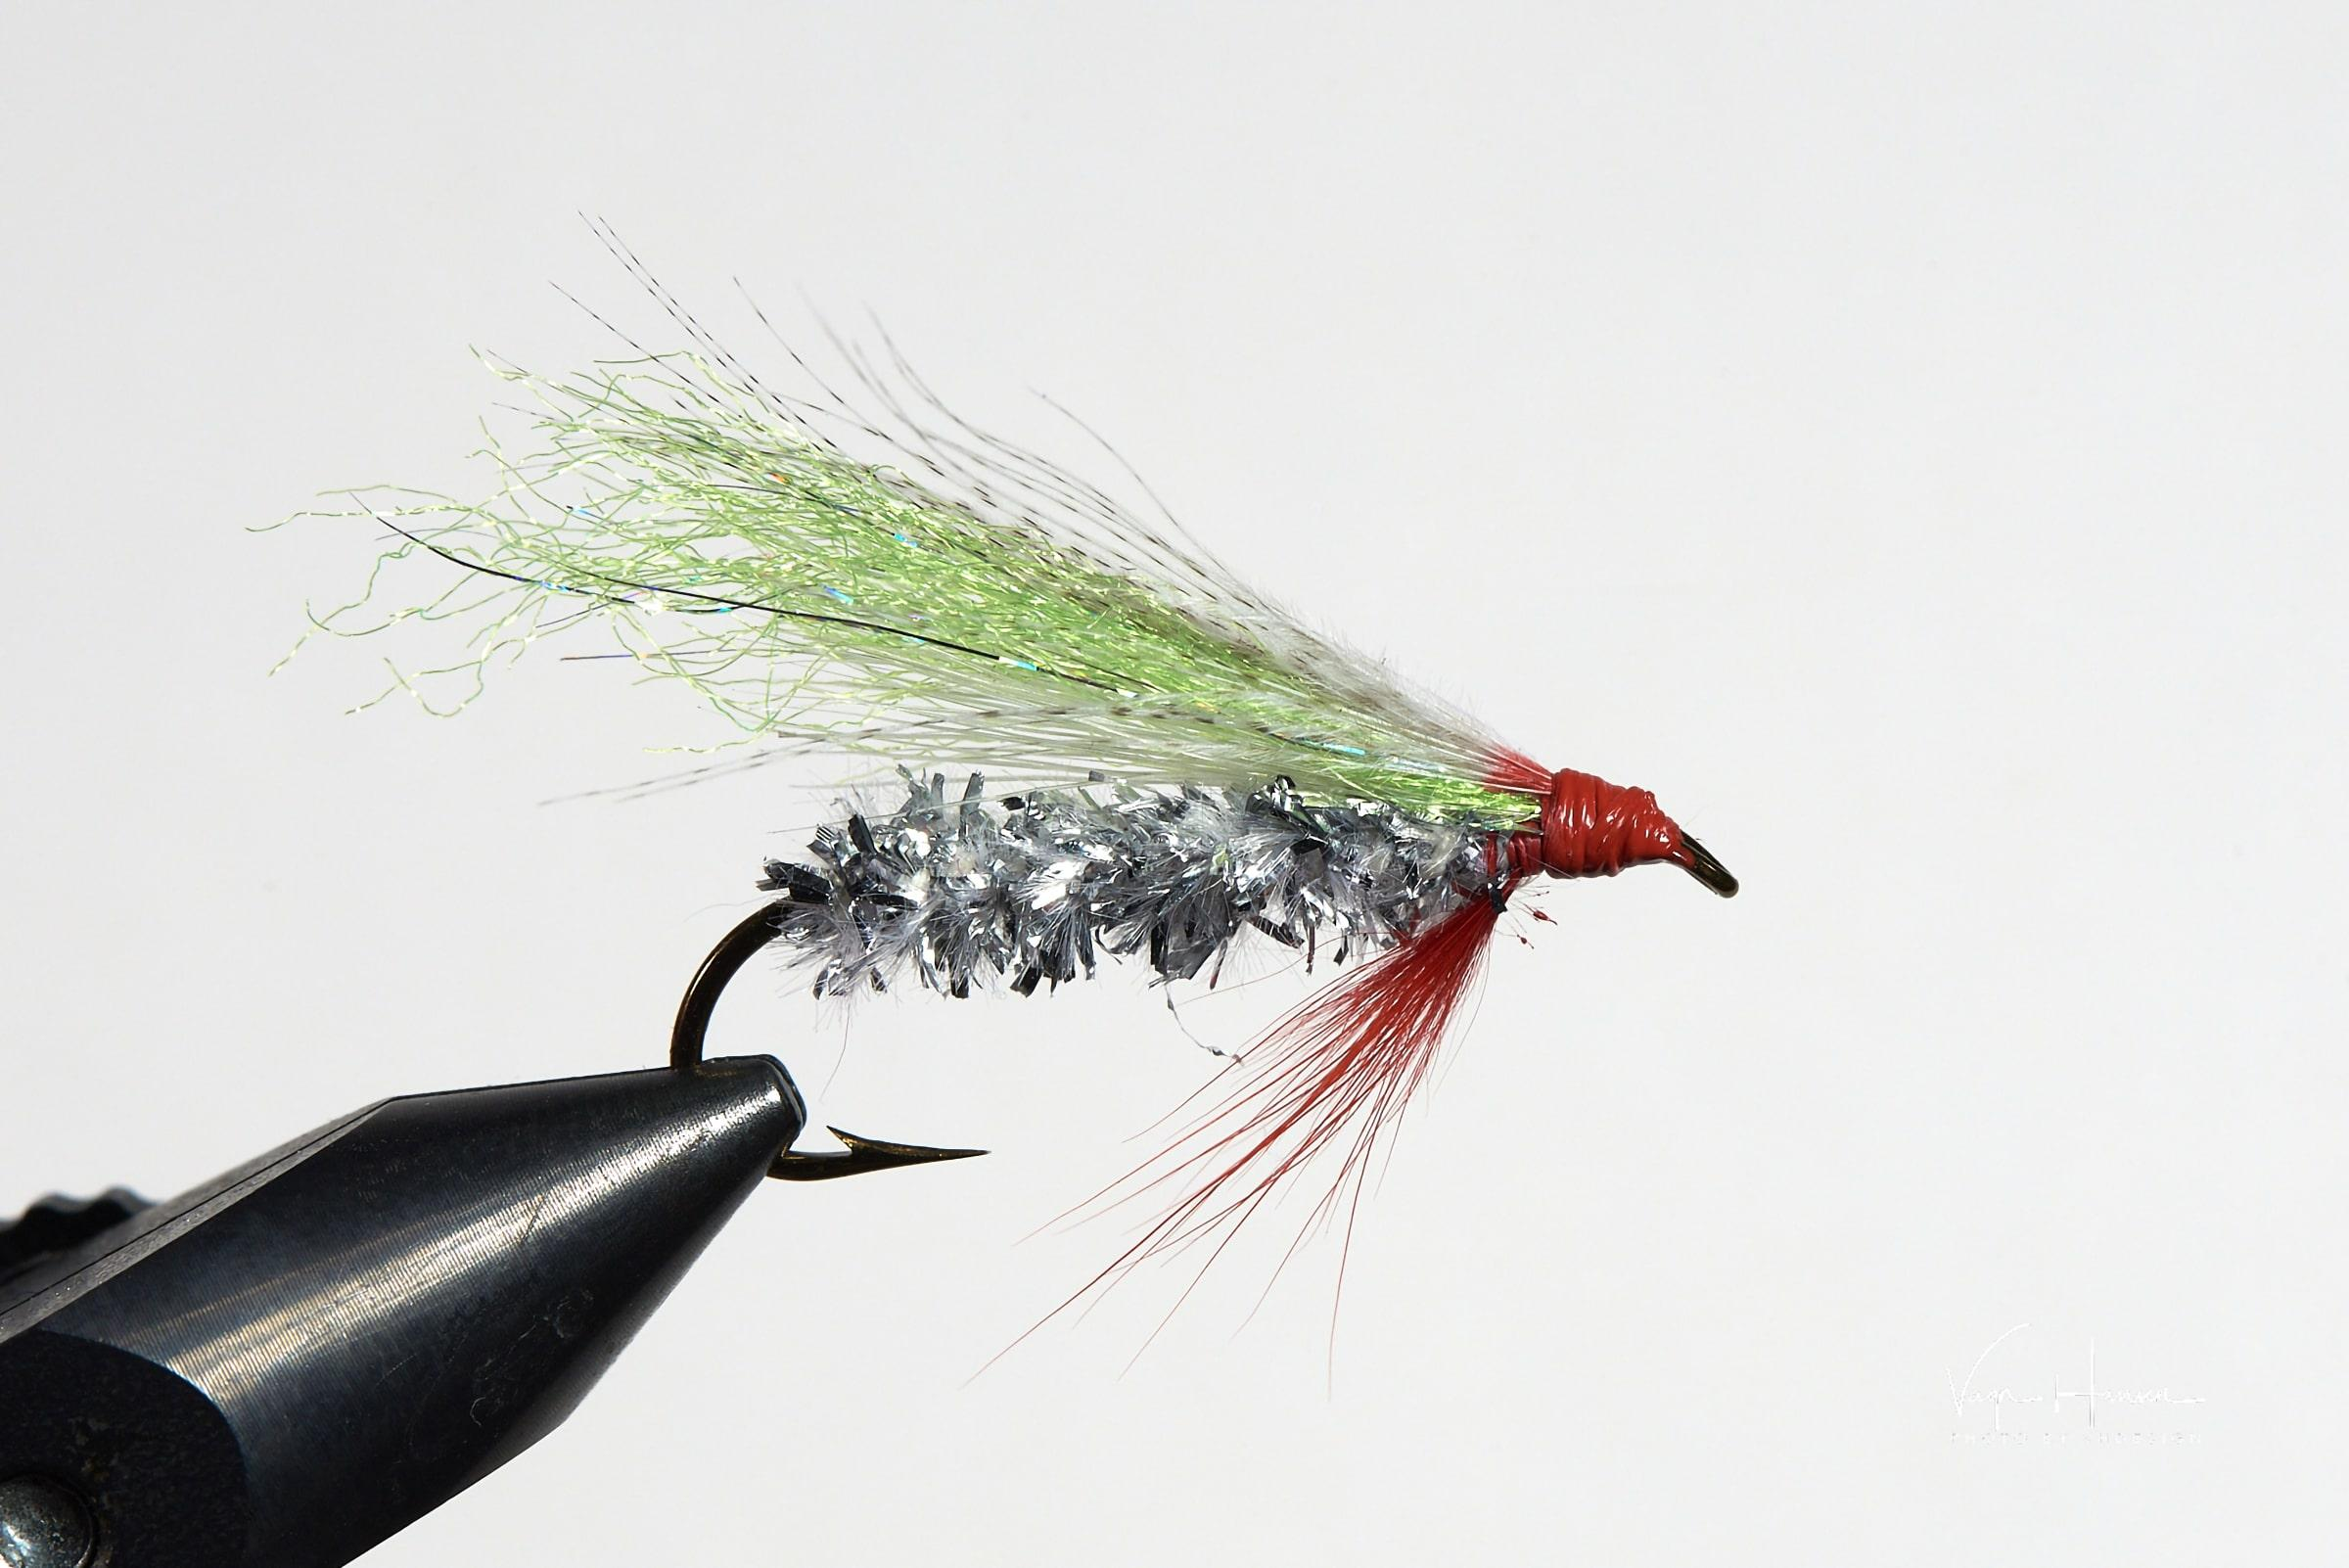 Smolt Fly fishy type. Photo by Vagn Hansen - Visit Greenland